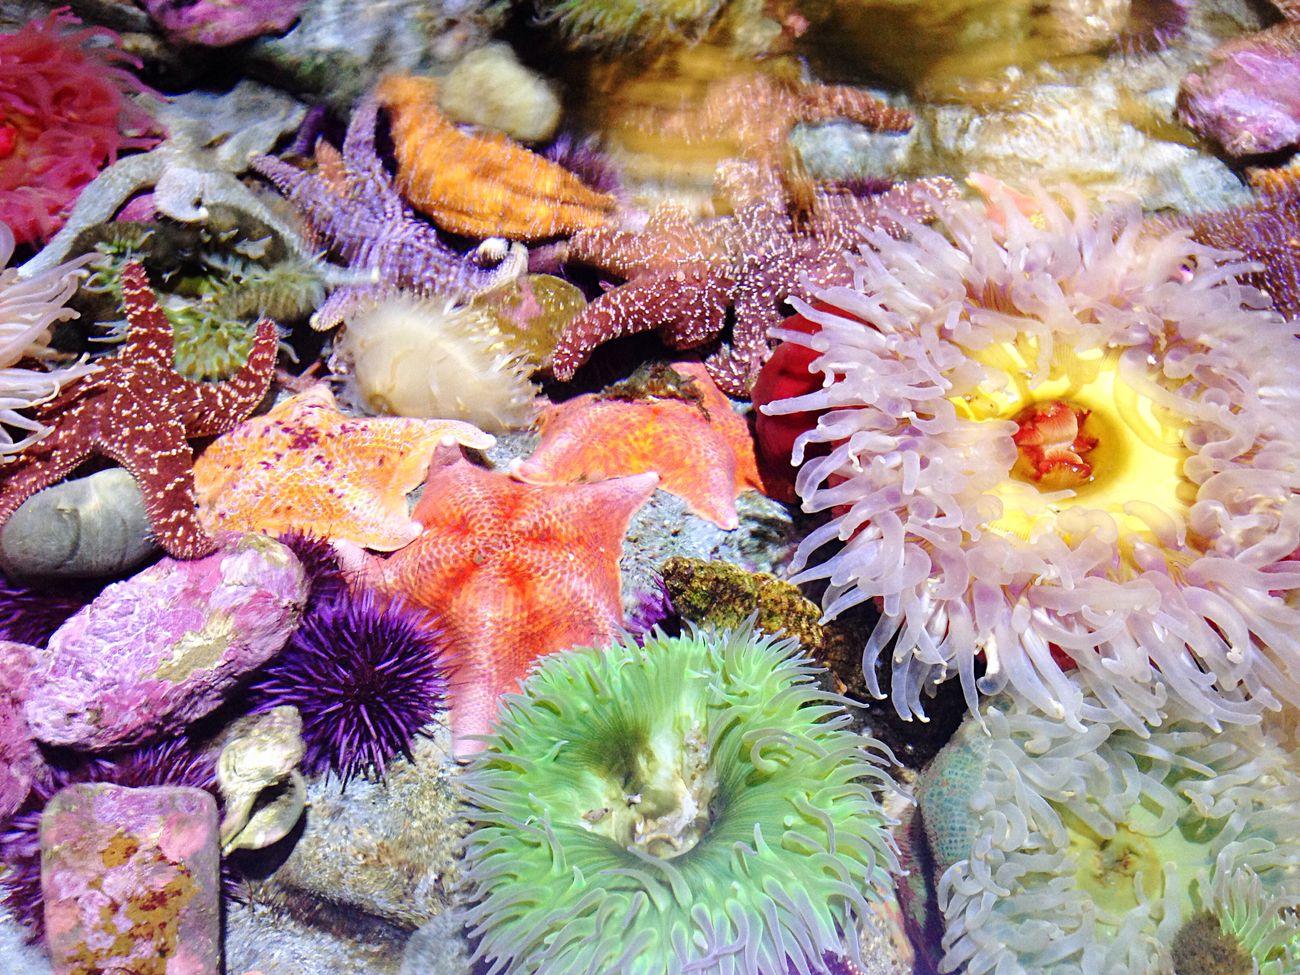 Live Corals Coral By Motorola EyeEm Best Shots EyeEm Nature Lover Nature